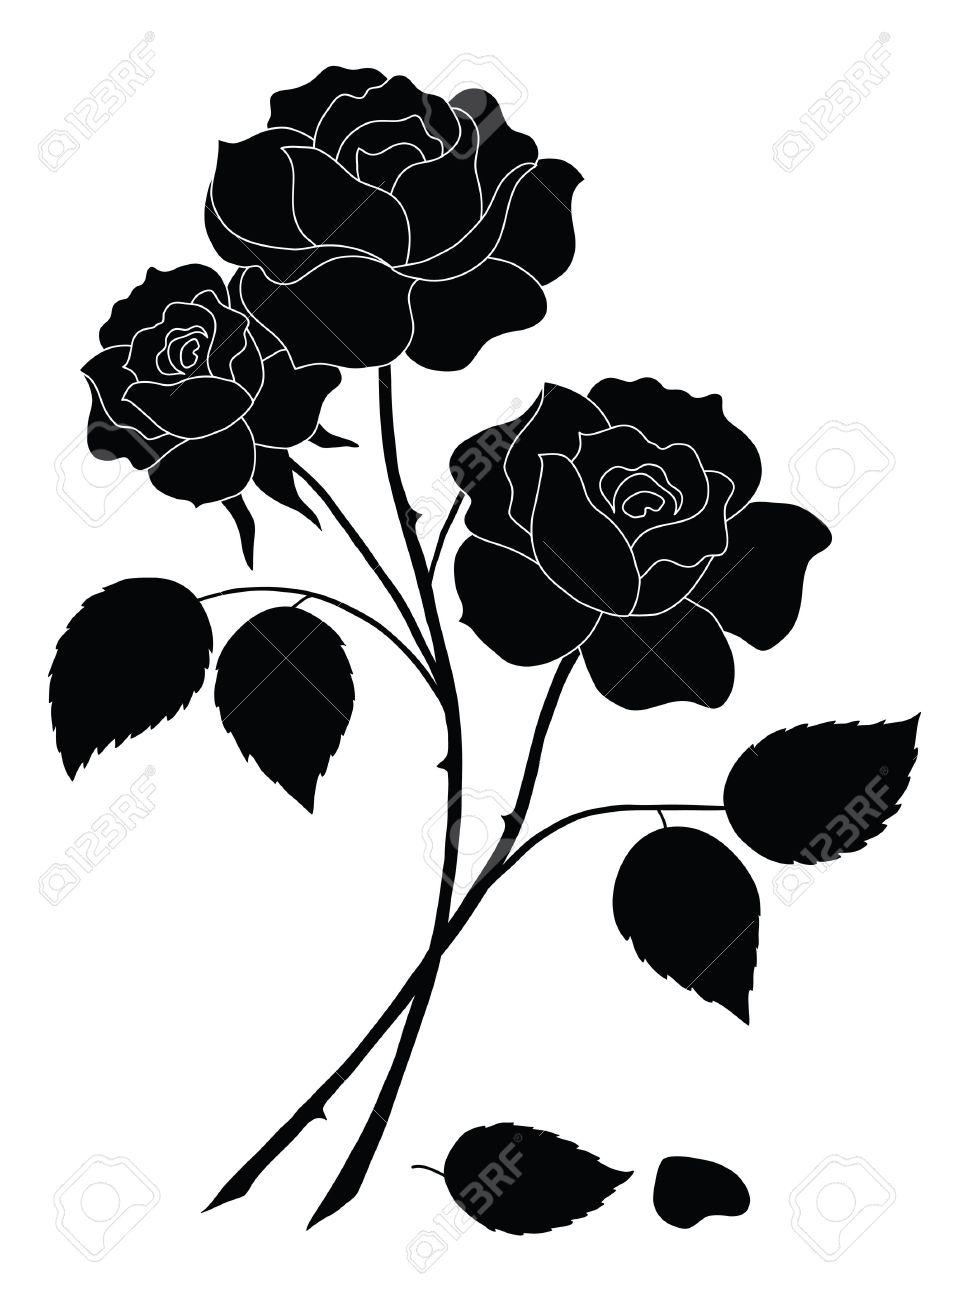 rose symbole l 39 atelier des fleurs. Black Bedroom Furniture Sets. Home Design Ideas